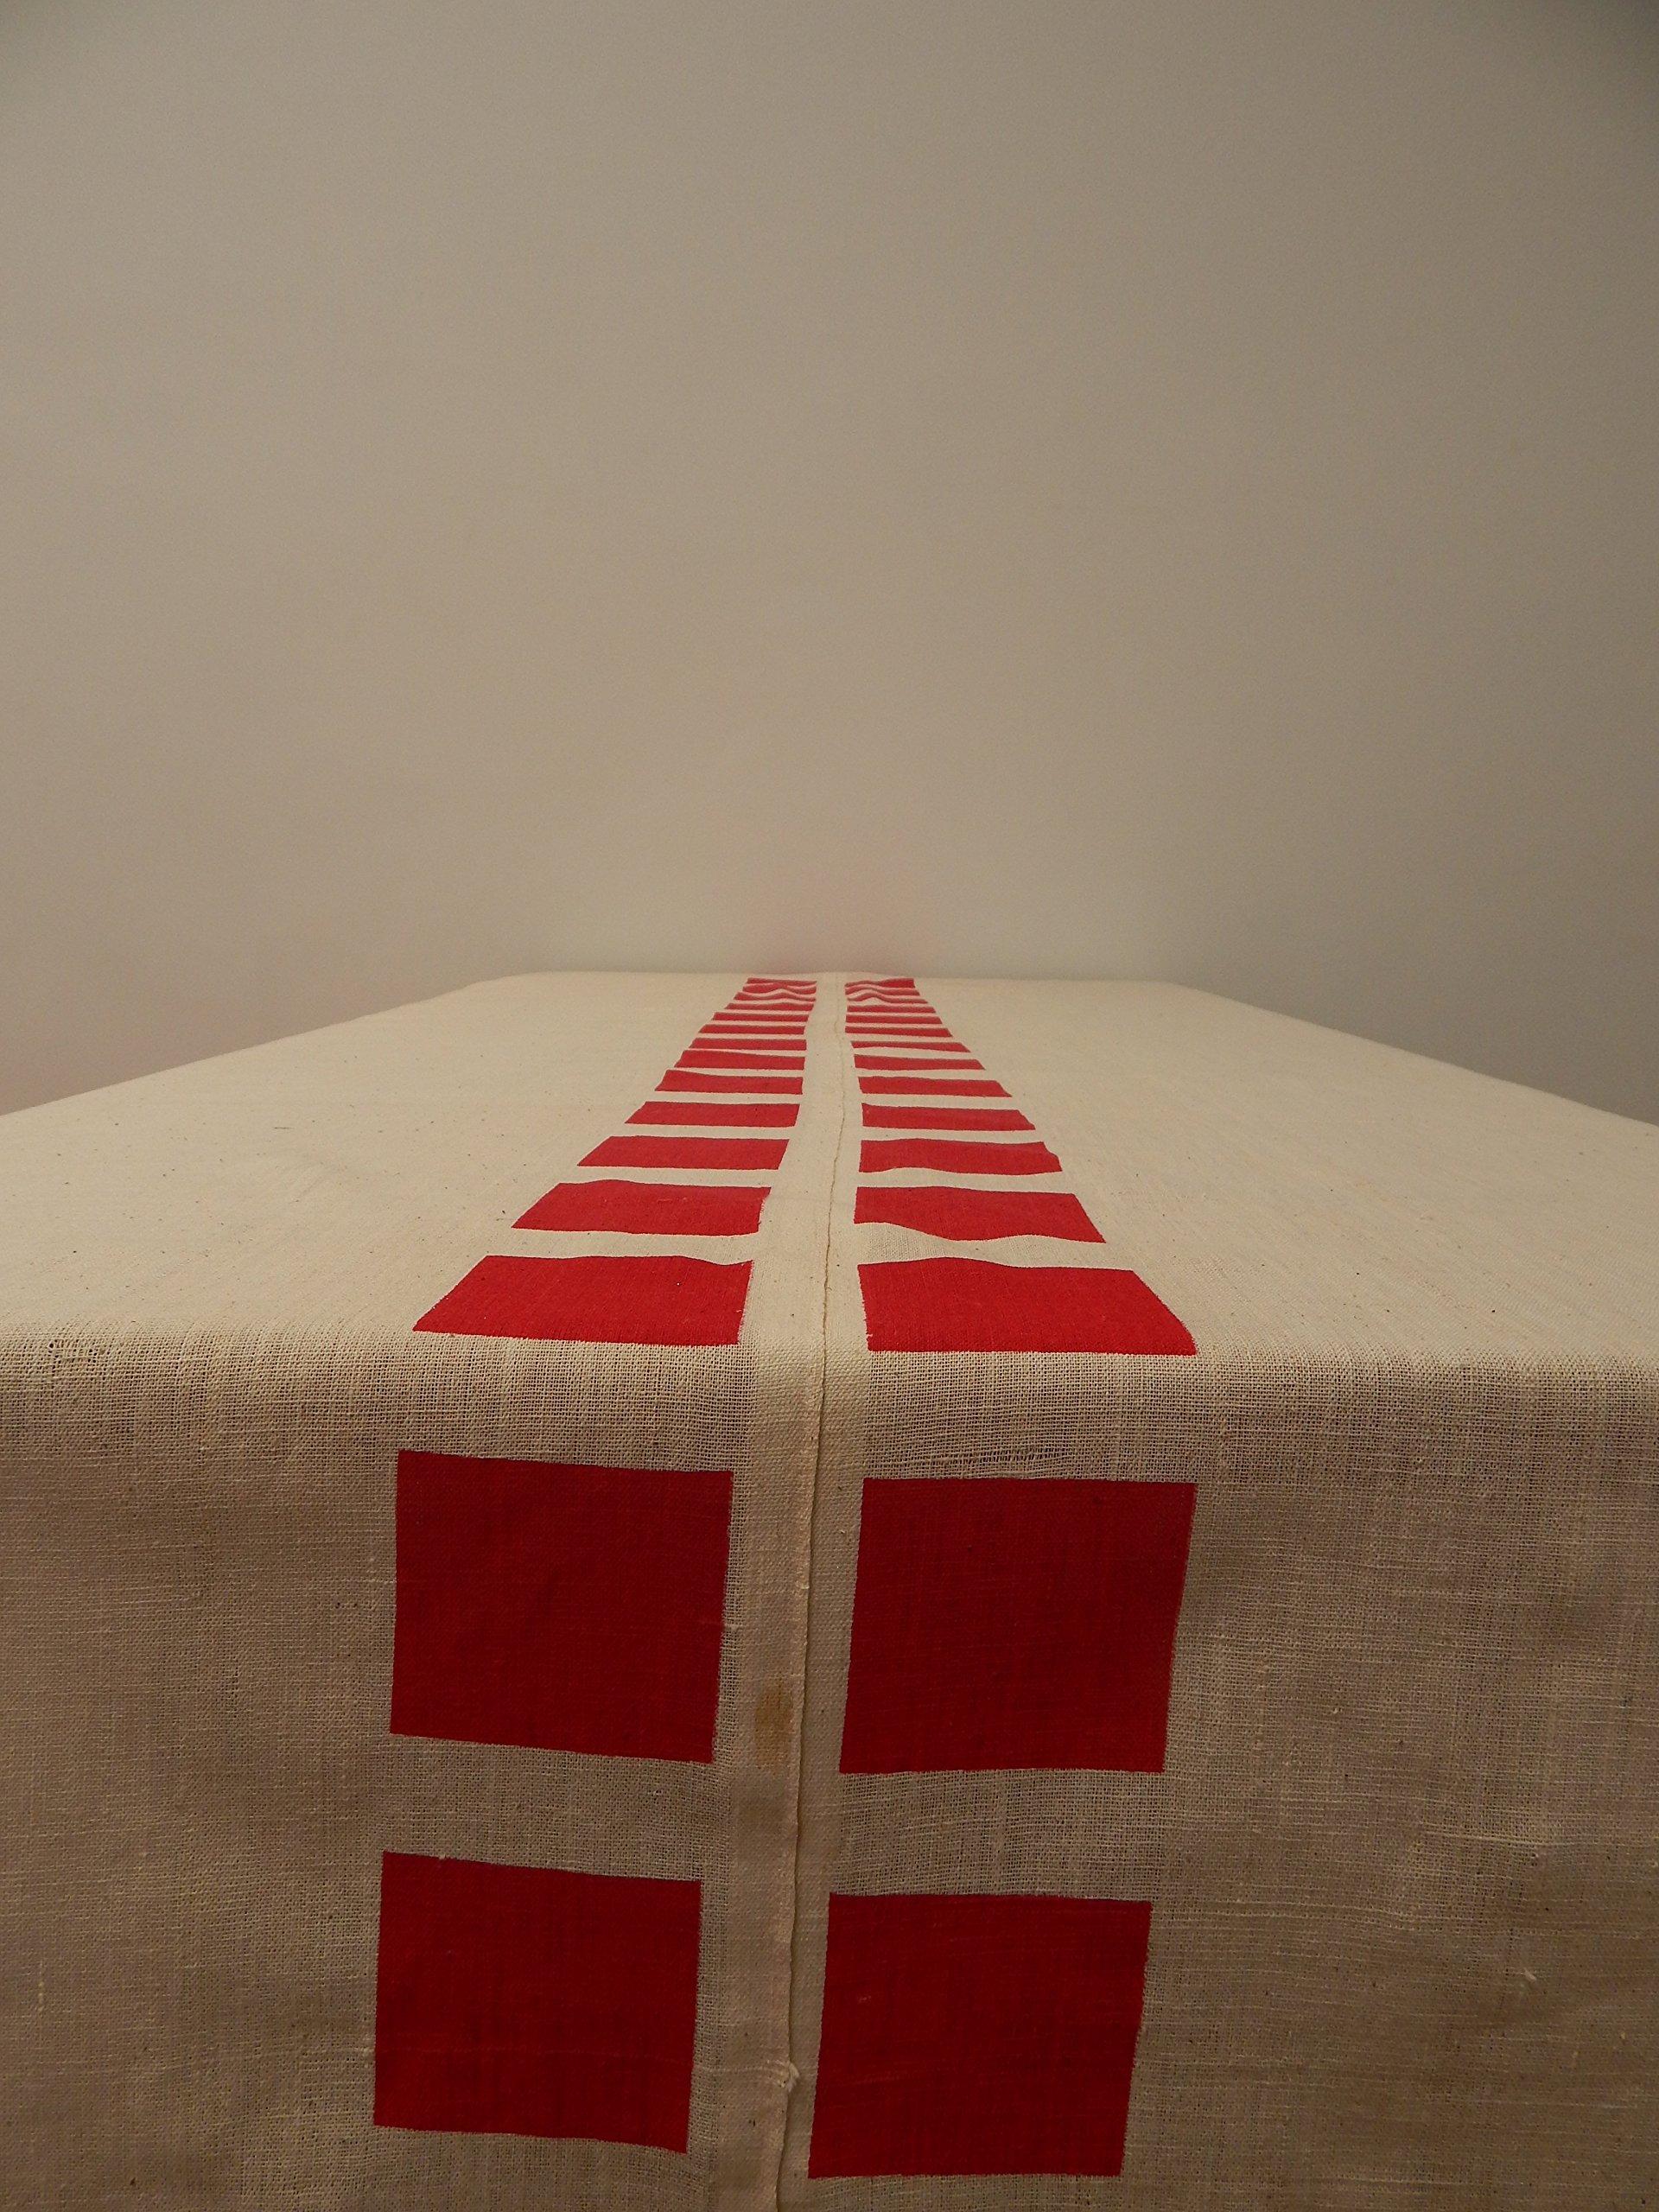 Gitika Goyal Home Cotton Khadi Red Screen Printed Tablecloth with Square Design, Cream, 72'' x 108''